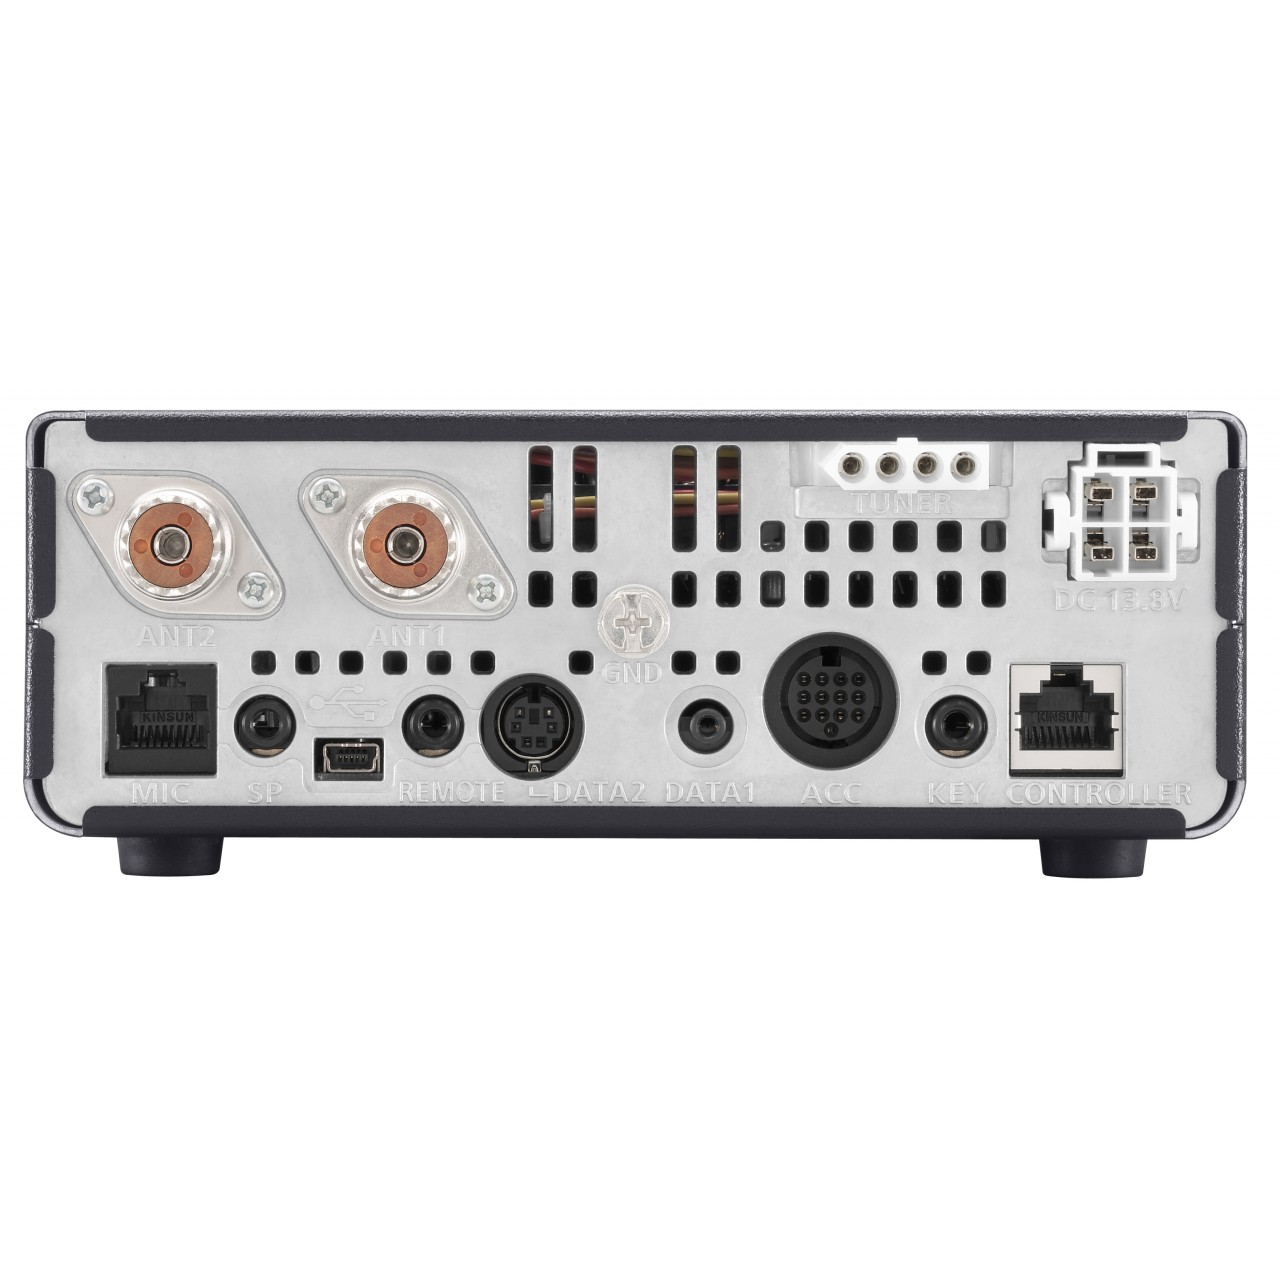 IC-7100 Mobiles - ICOM